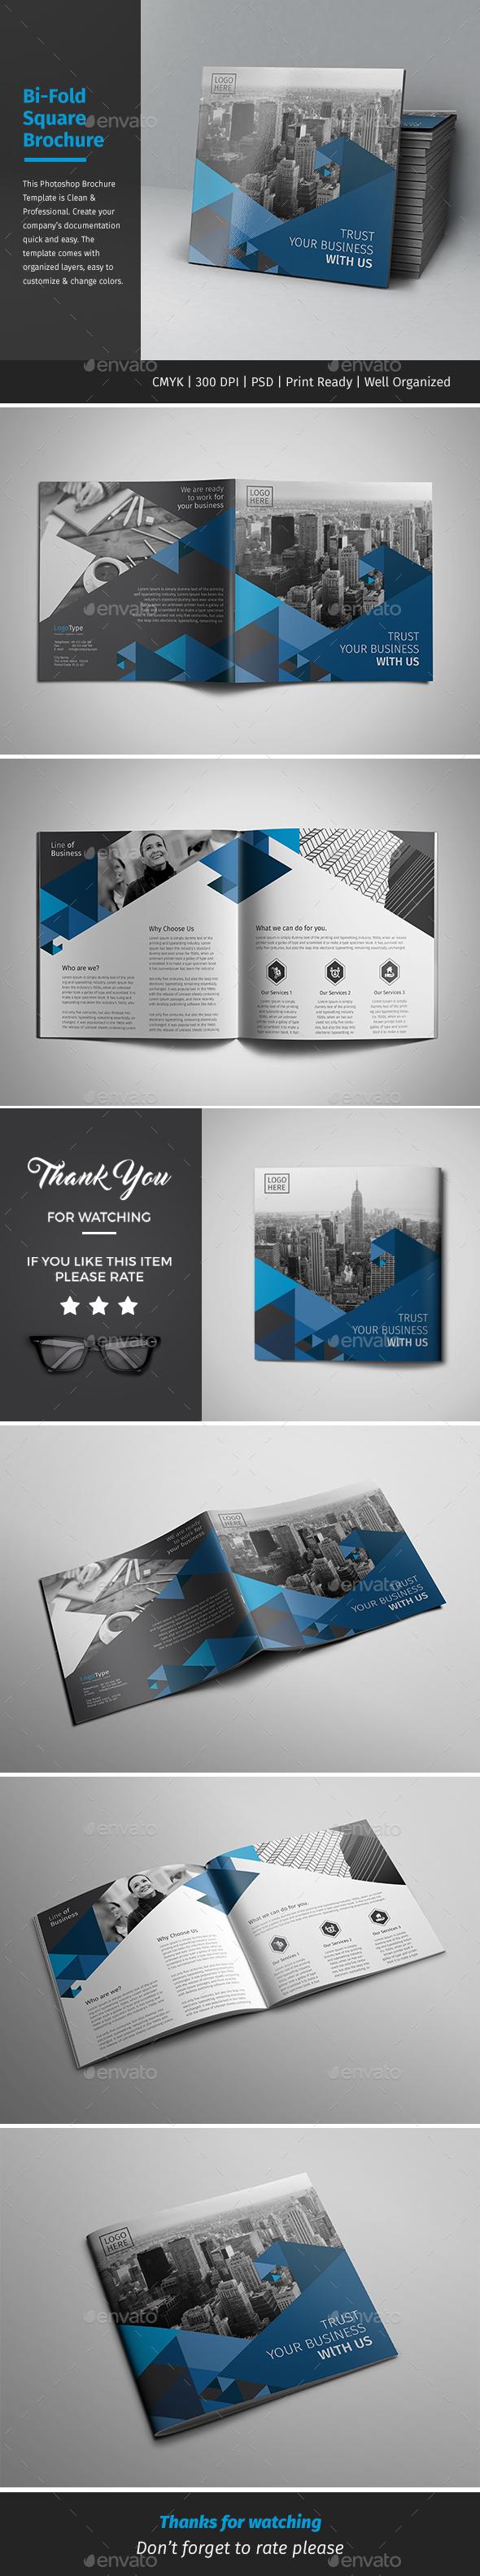 Corporate Bi-fold Square Brochure Template PSD.